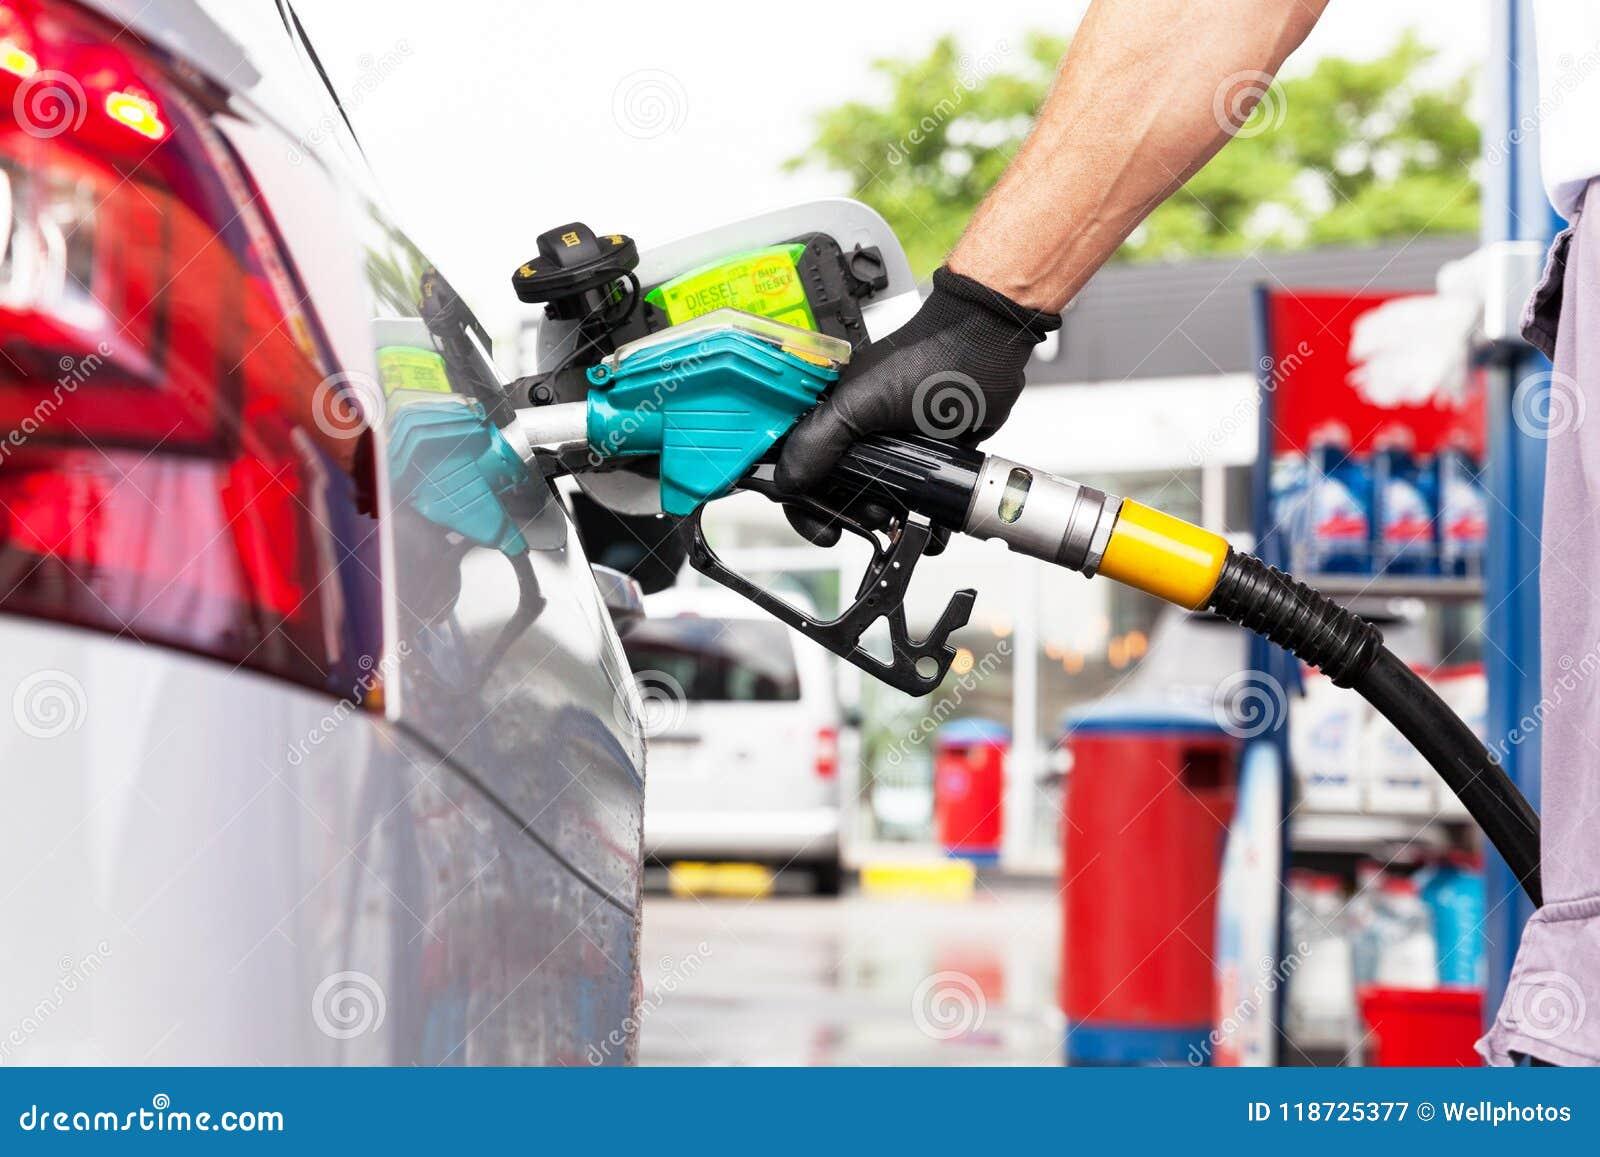 Man filling diesel fuel in car at gas station